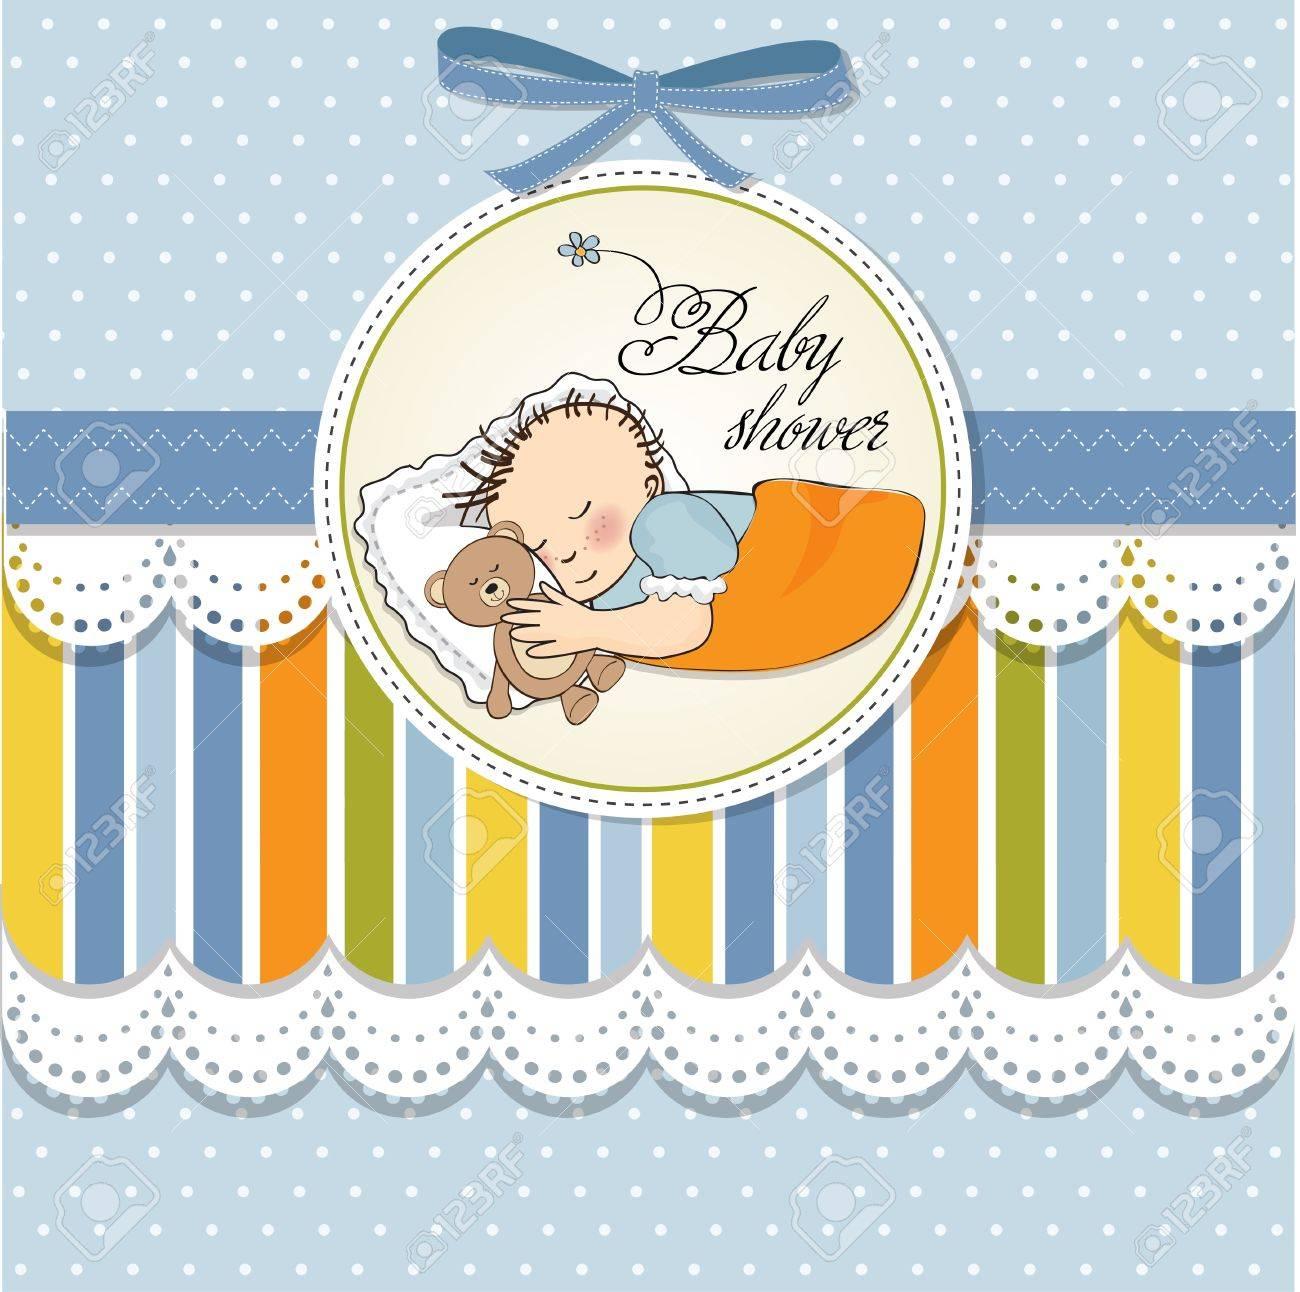 little baby boy sleep with his teddy bear toy  Baby shower card Stock Vector - 12786155